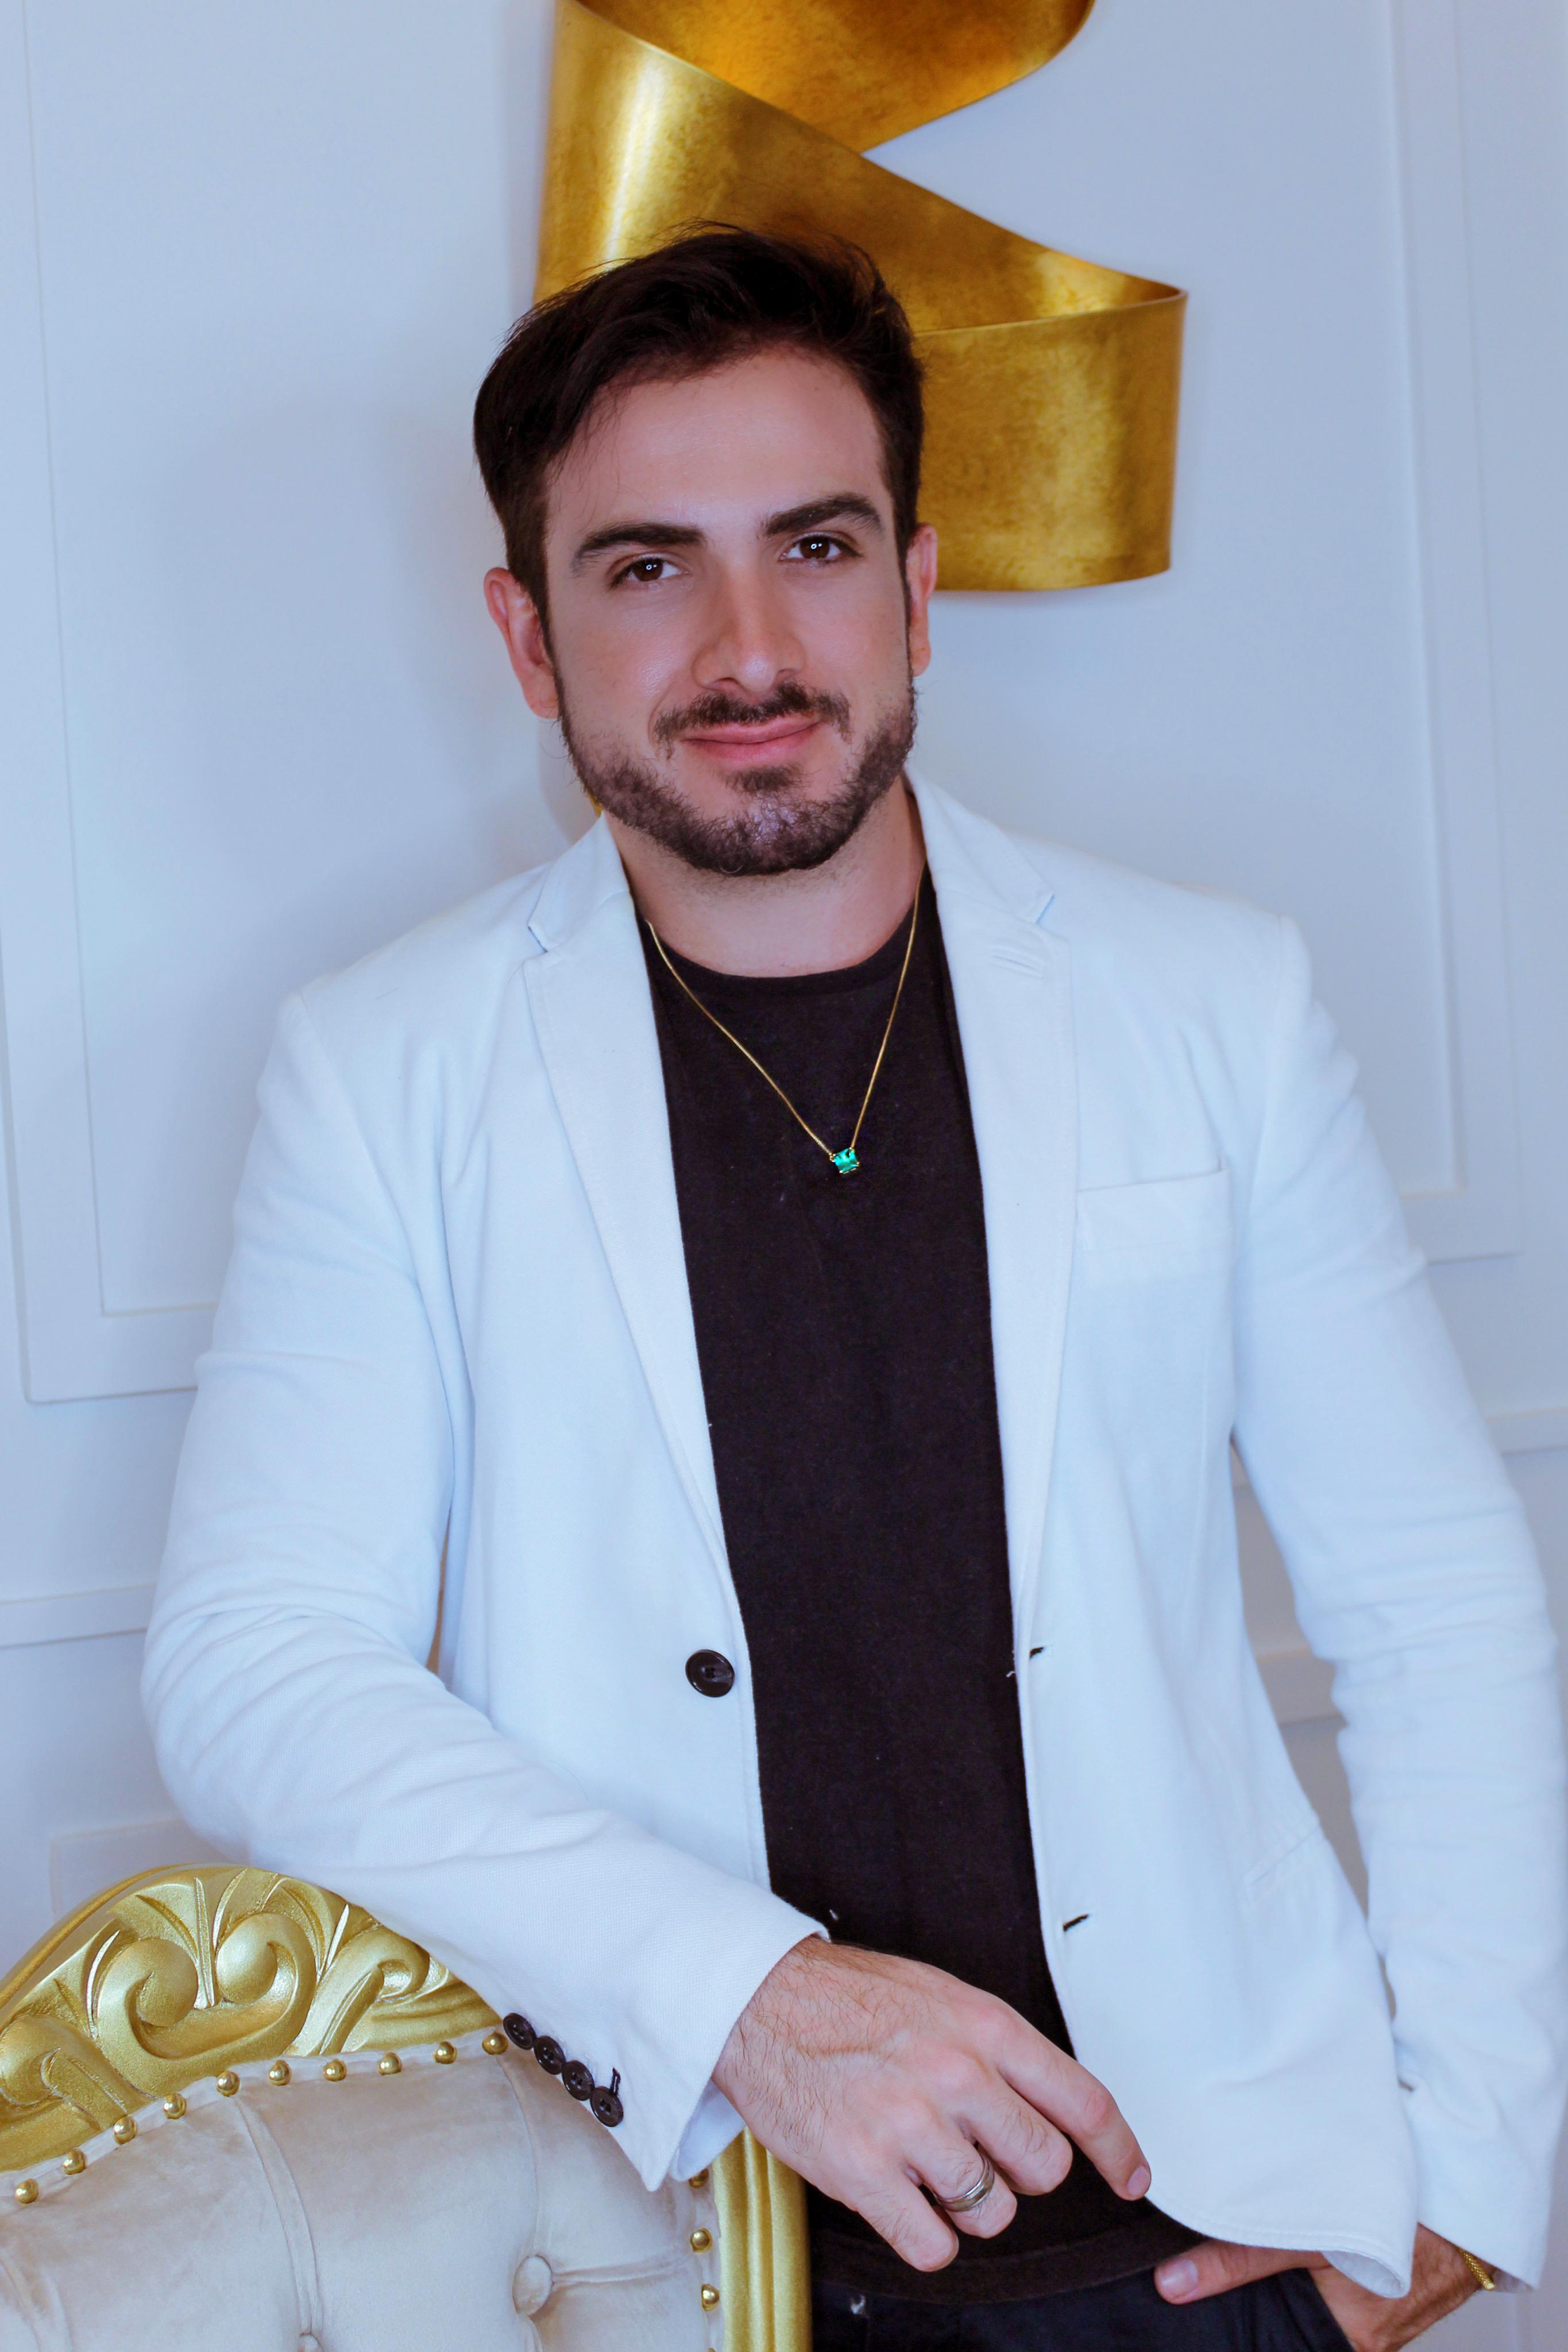 Dr. Diogo Branco